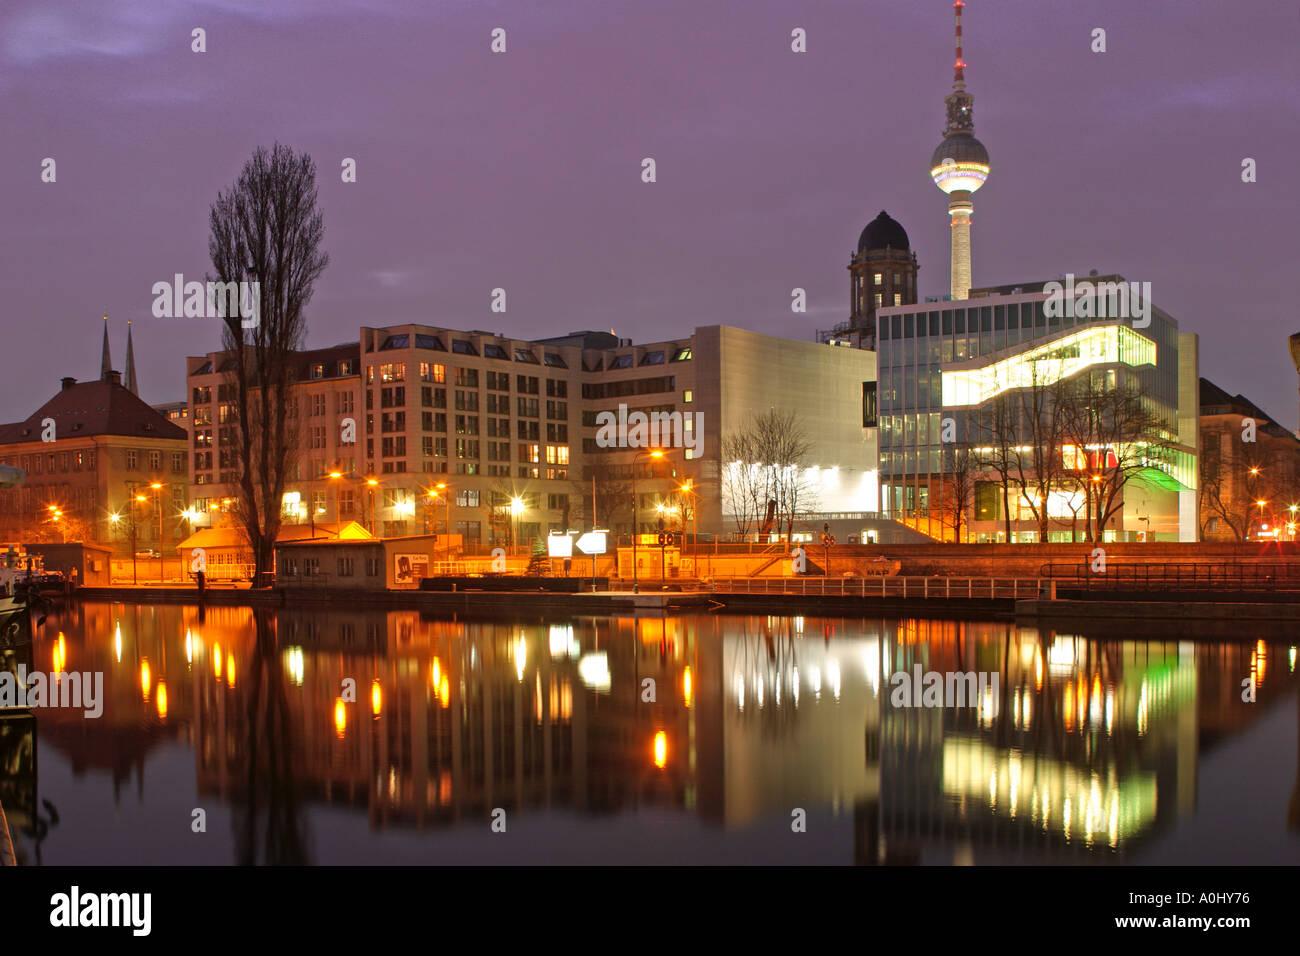 Netherlands Embassy architect  Rem Koolhaas river Spree Alex TV tower twilight - Stock Image